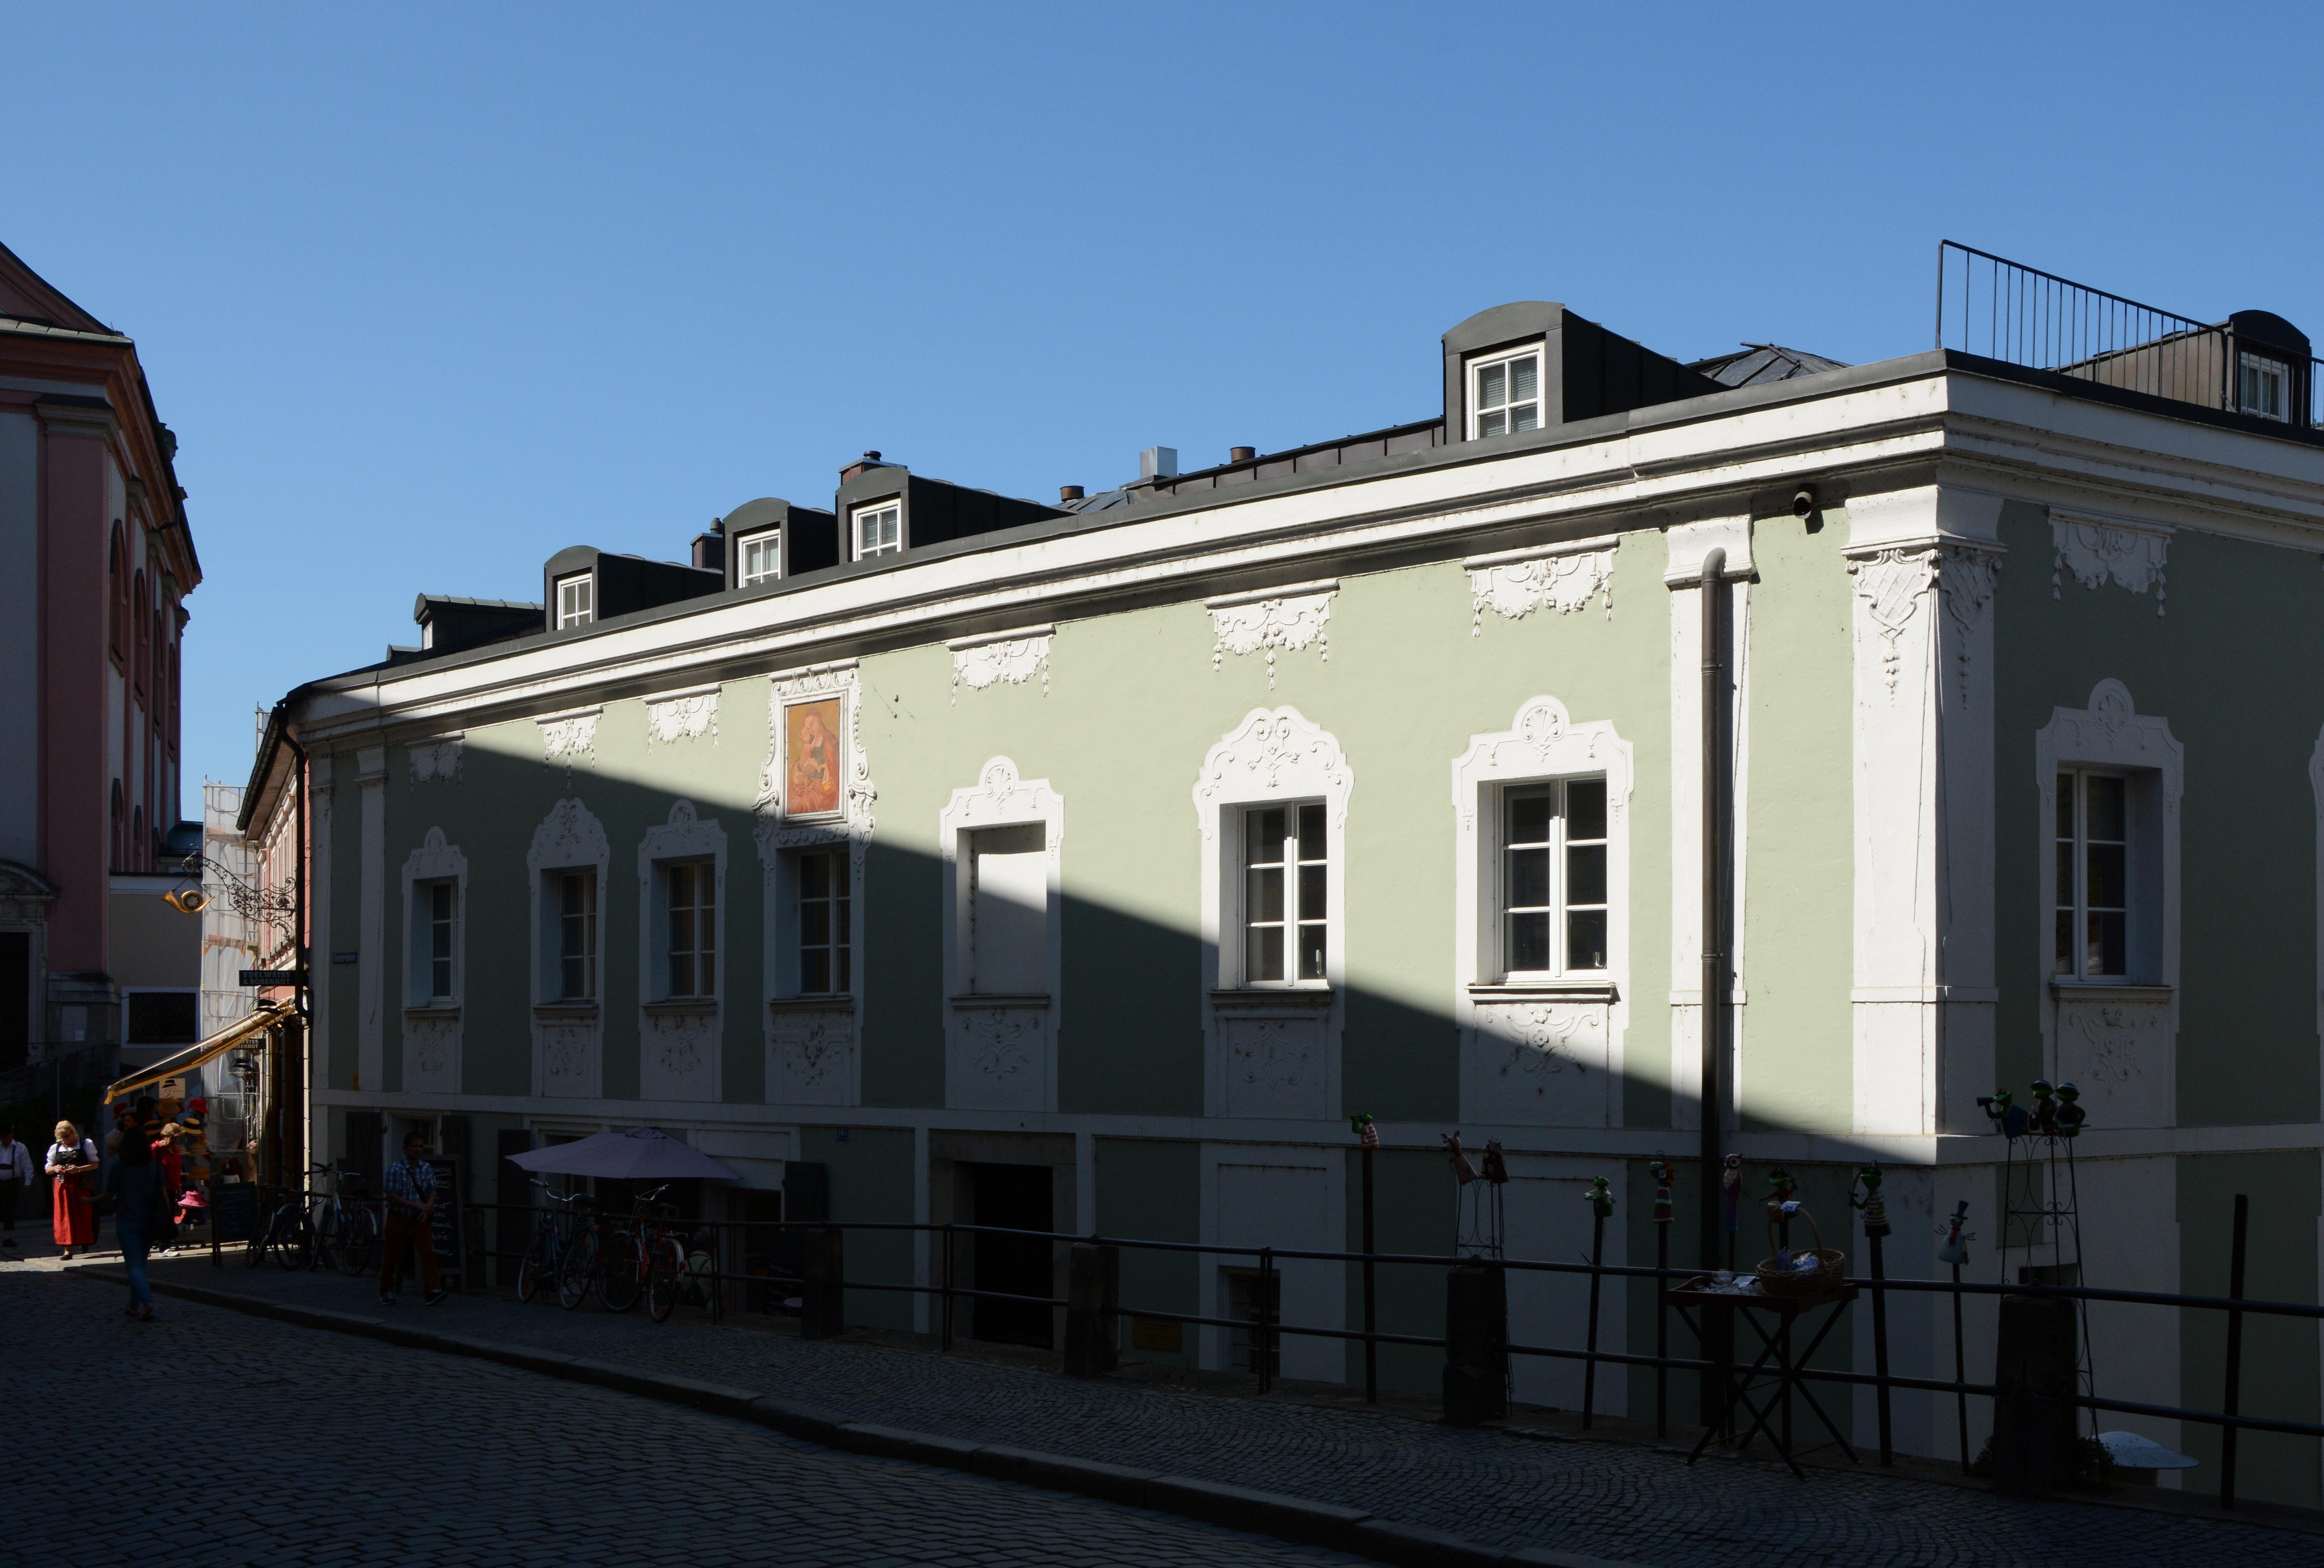 Dateisteinweg 16a Passau Cjpg Wikipedia